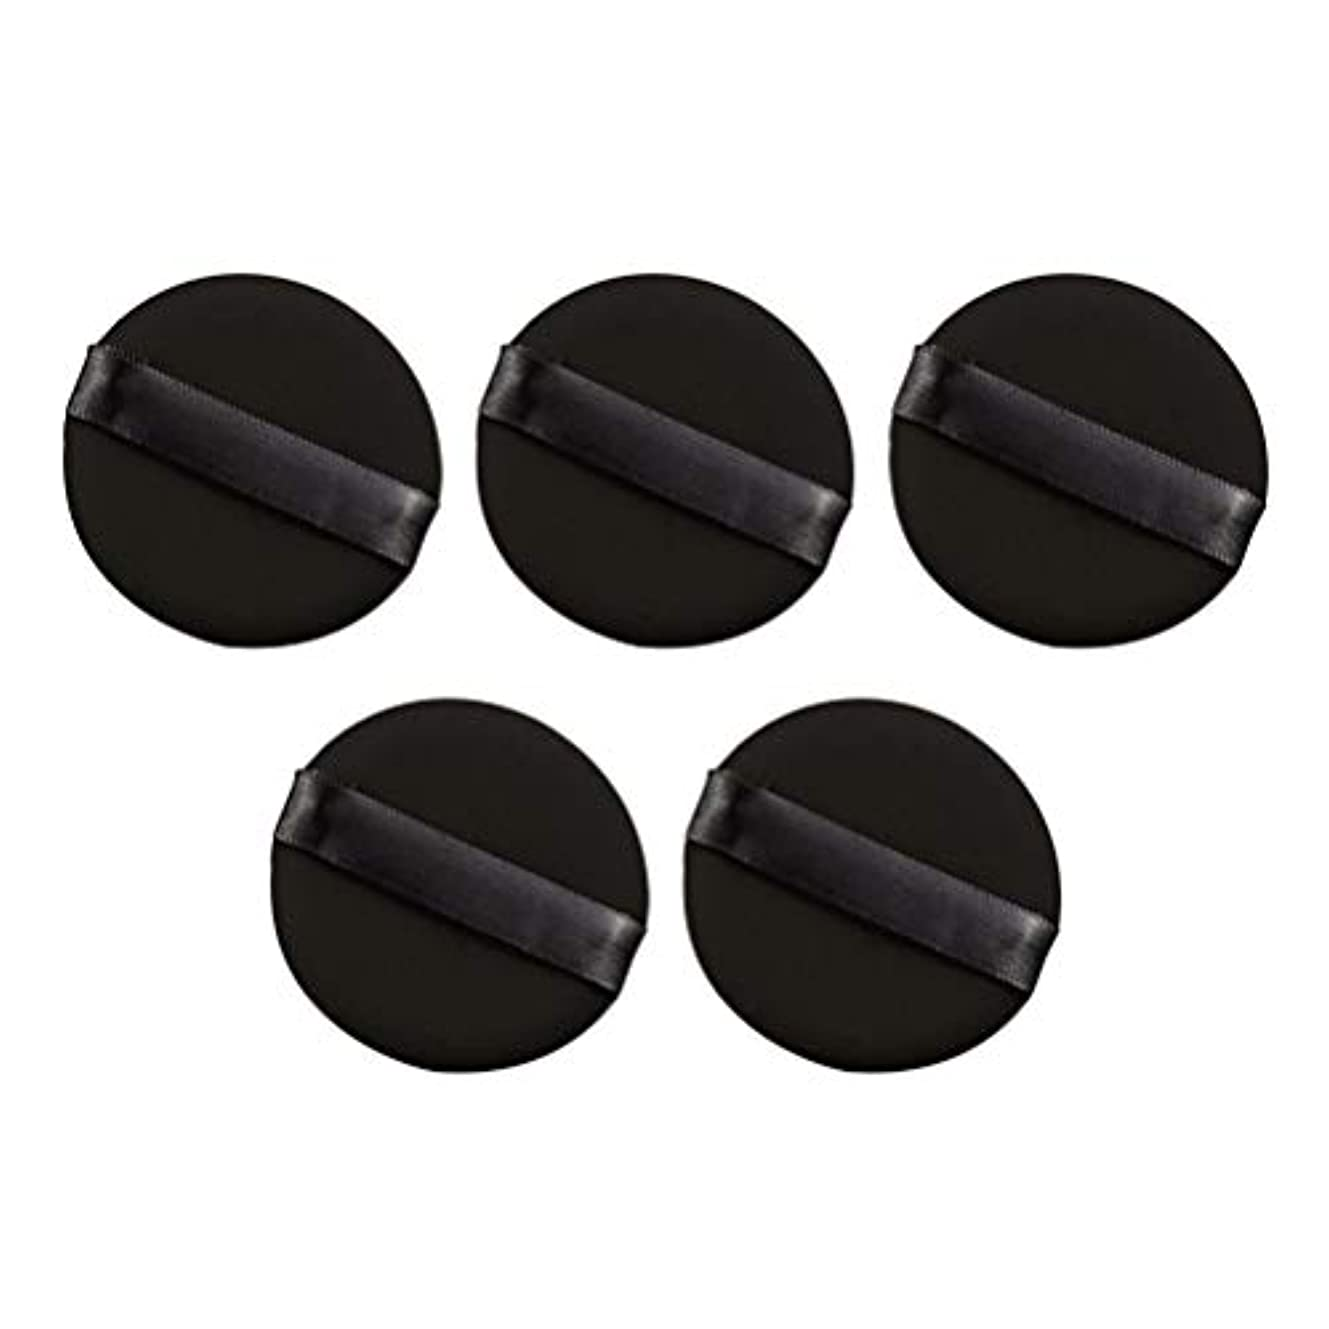 Frcolor パウダーパフ エアクッション 化粧ツール ラテックスではない 弾力性 化粧品 旅行用 5個セット(ブラック)